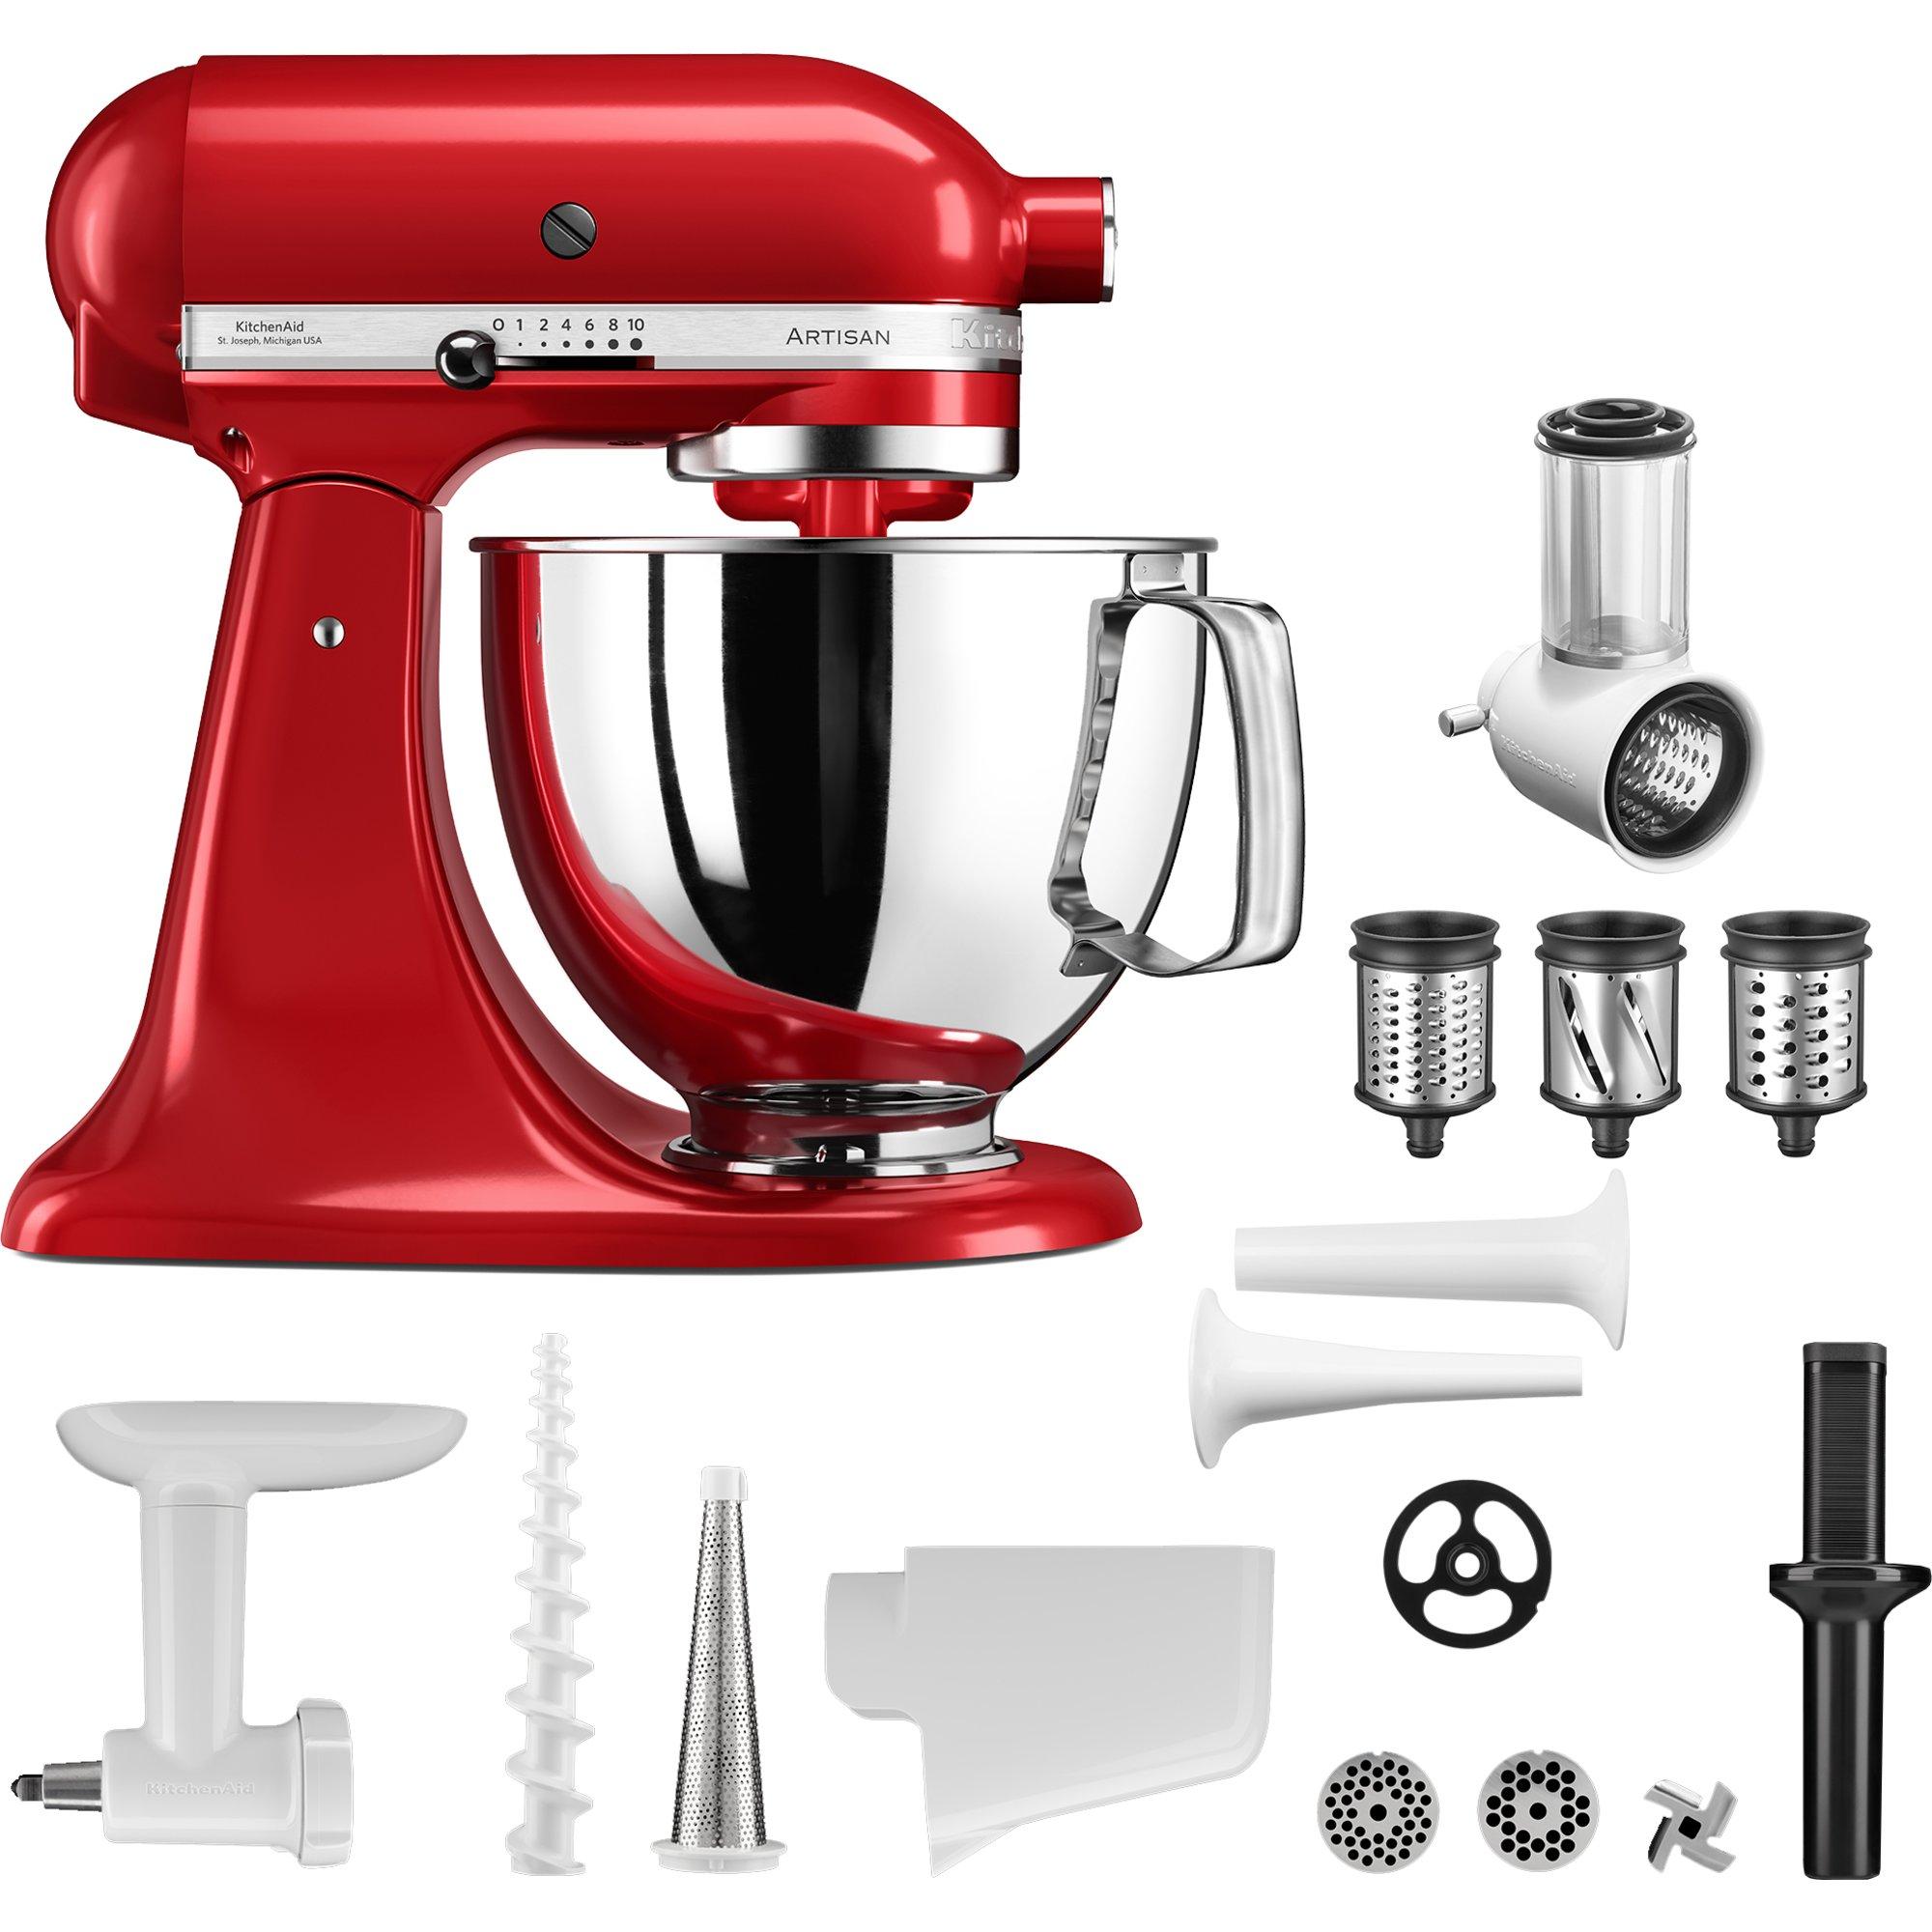 Bild av KitchenAid Artisan Köksmaskin (röd) + tillbehörspaket